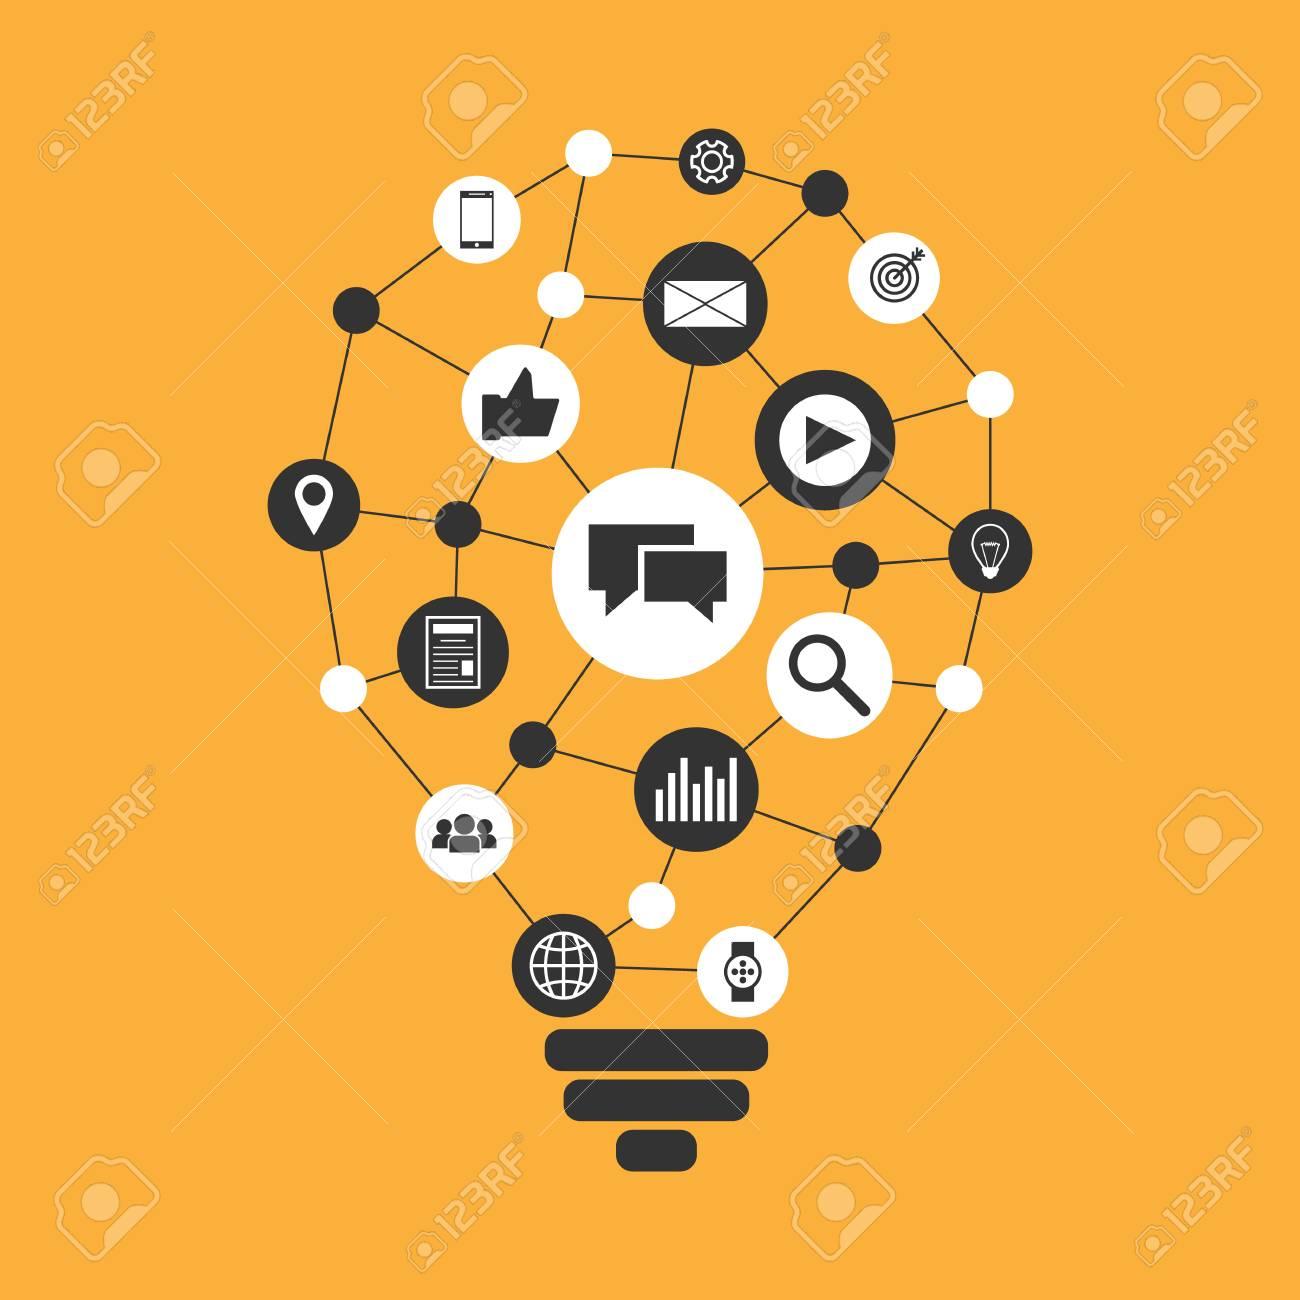 digital marketing vector illustration royalty free cliparts vectors and stock illustration image 76713610 digital marketing vector illustration